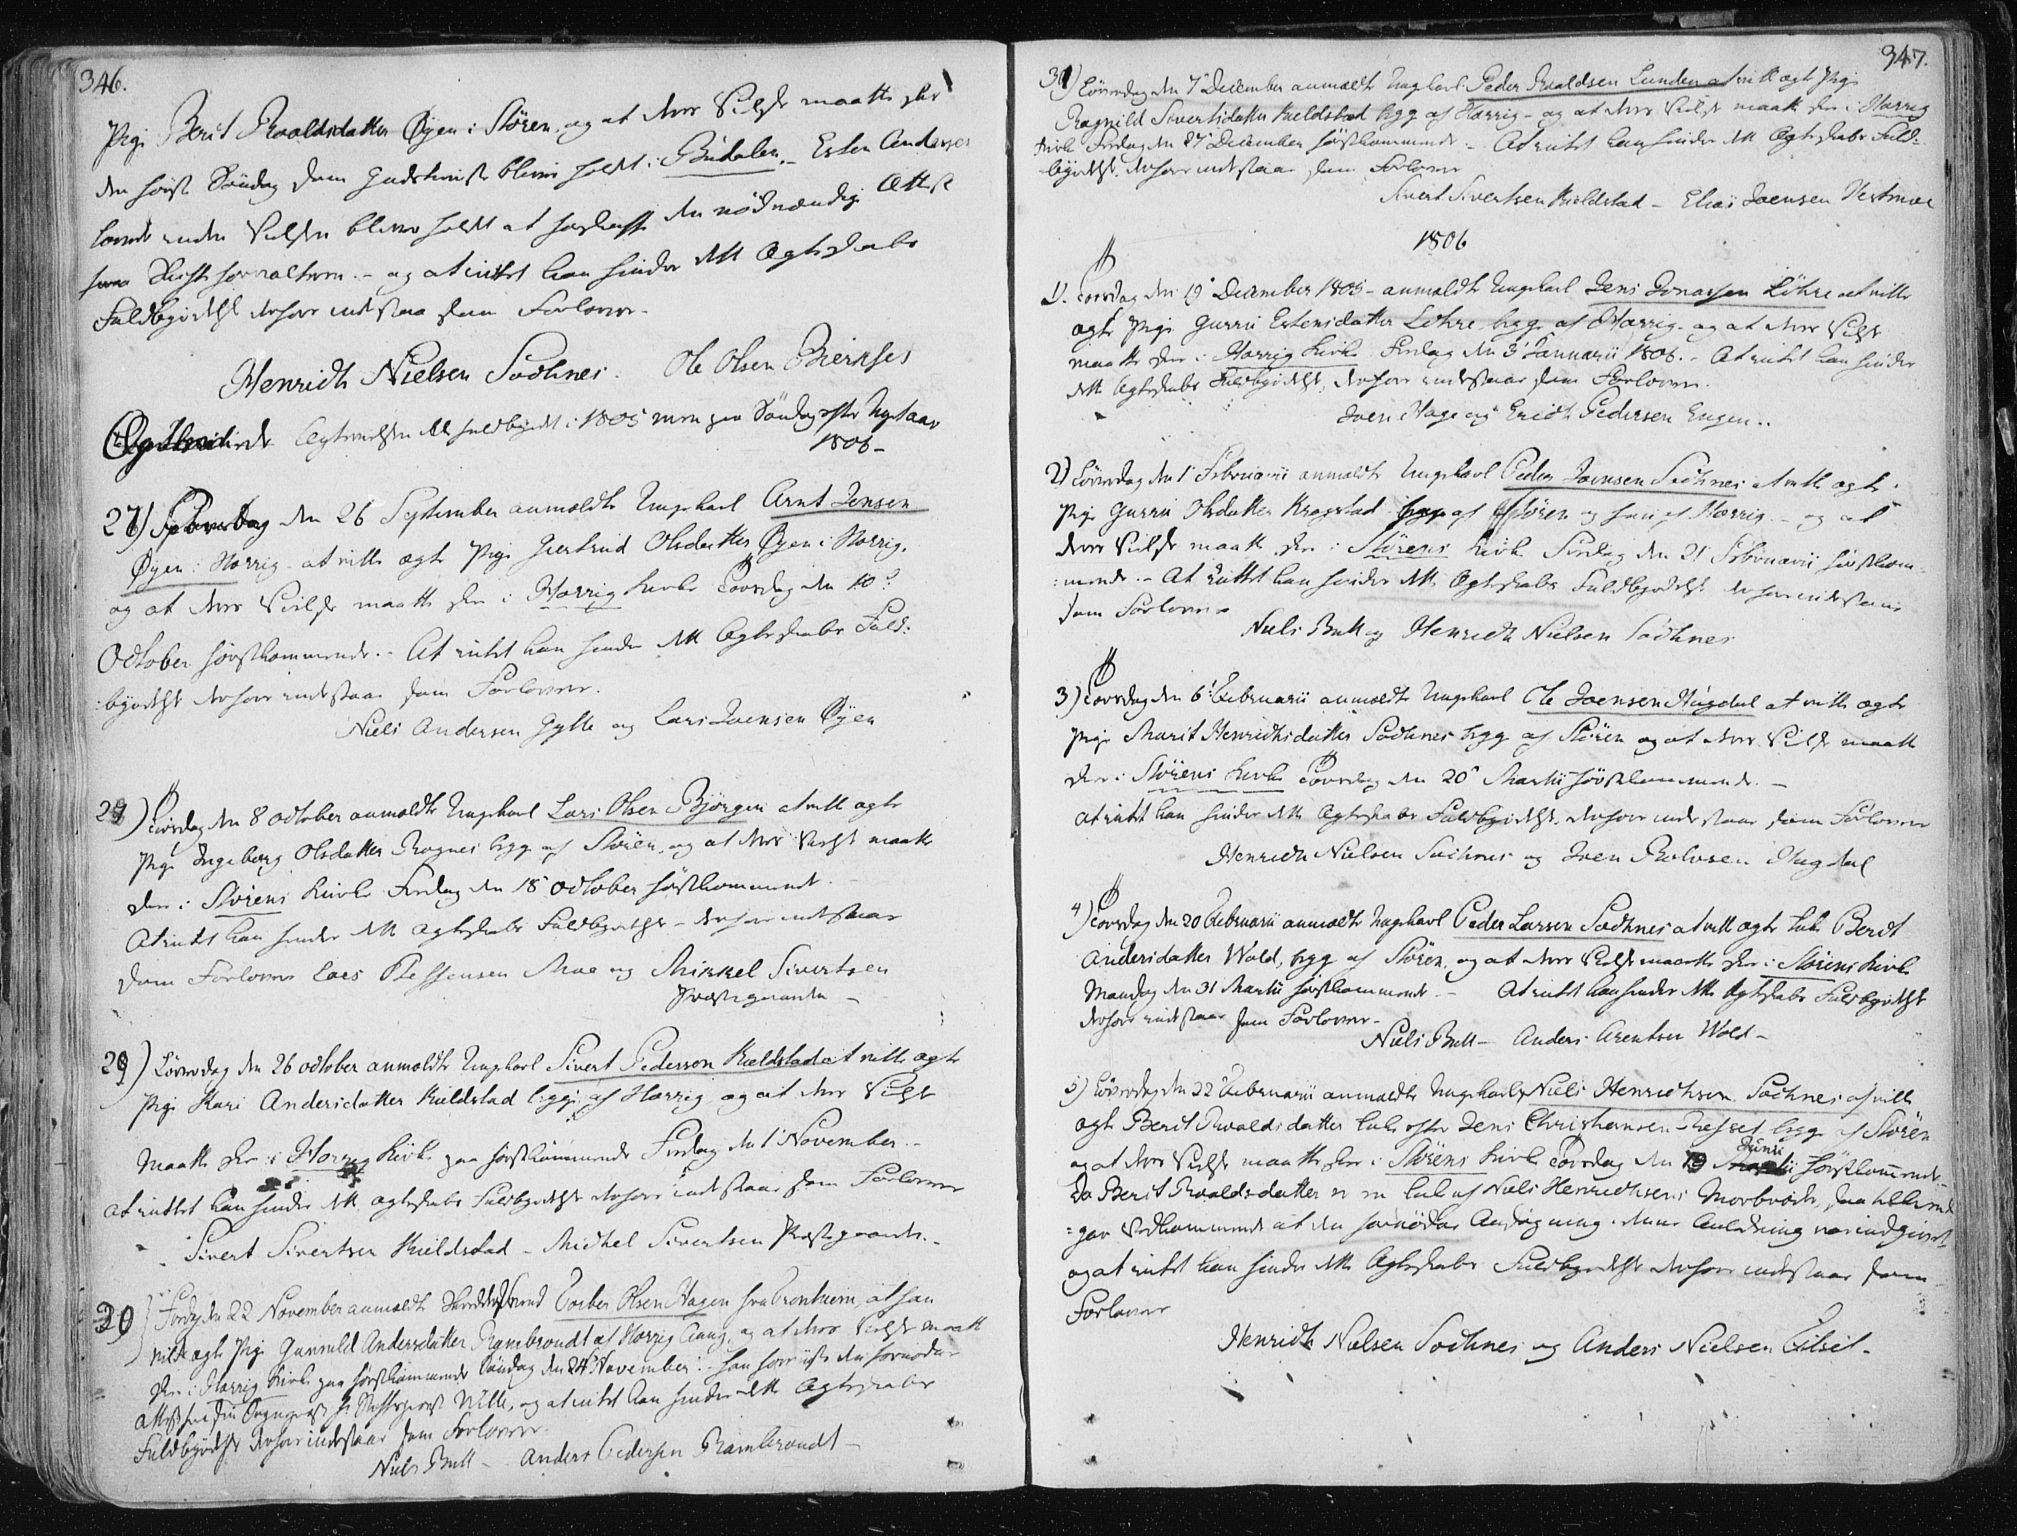 SAT, Ministerialprotokoller, klokkerbøker og fødselsregistre - Sør-Trøndelag, 687/L0992: Parish register (official) no. 687A03 /1, 1788-1815, p. 346-347